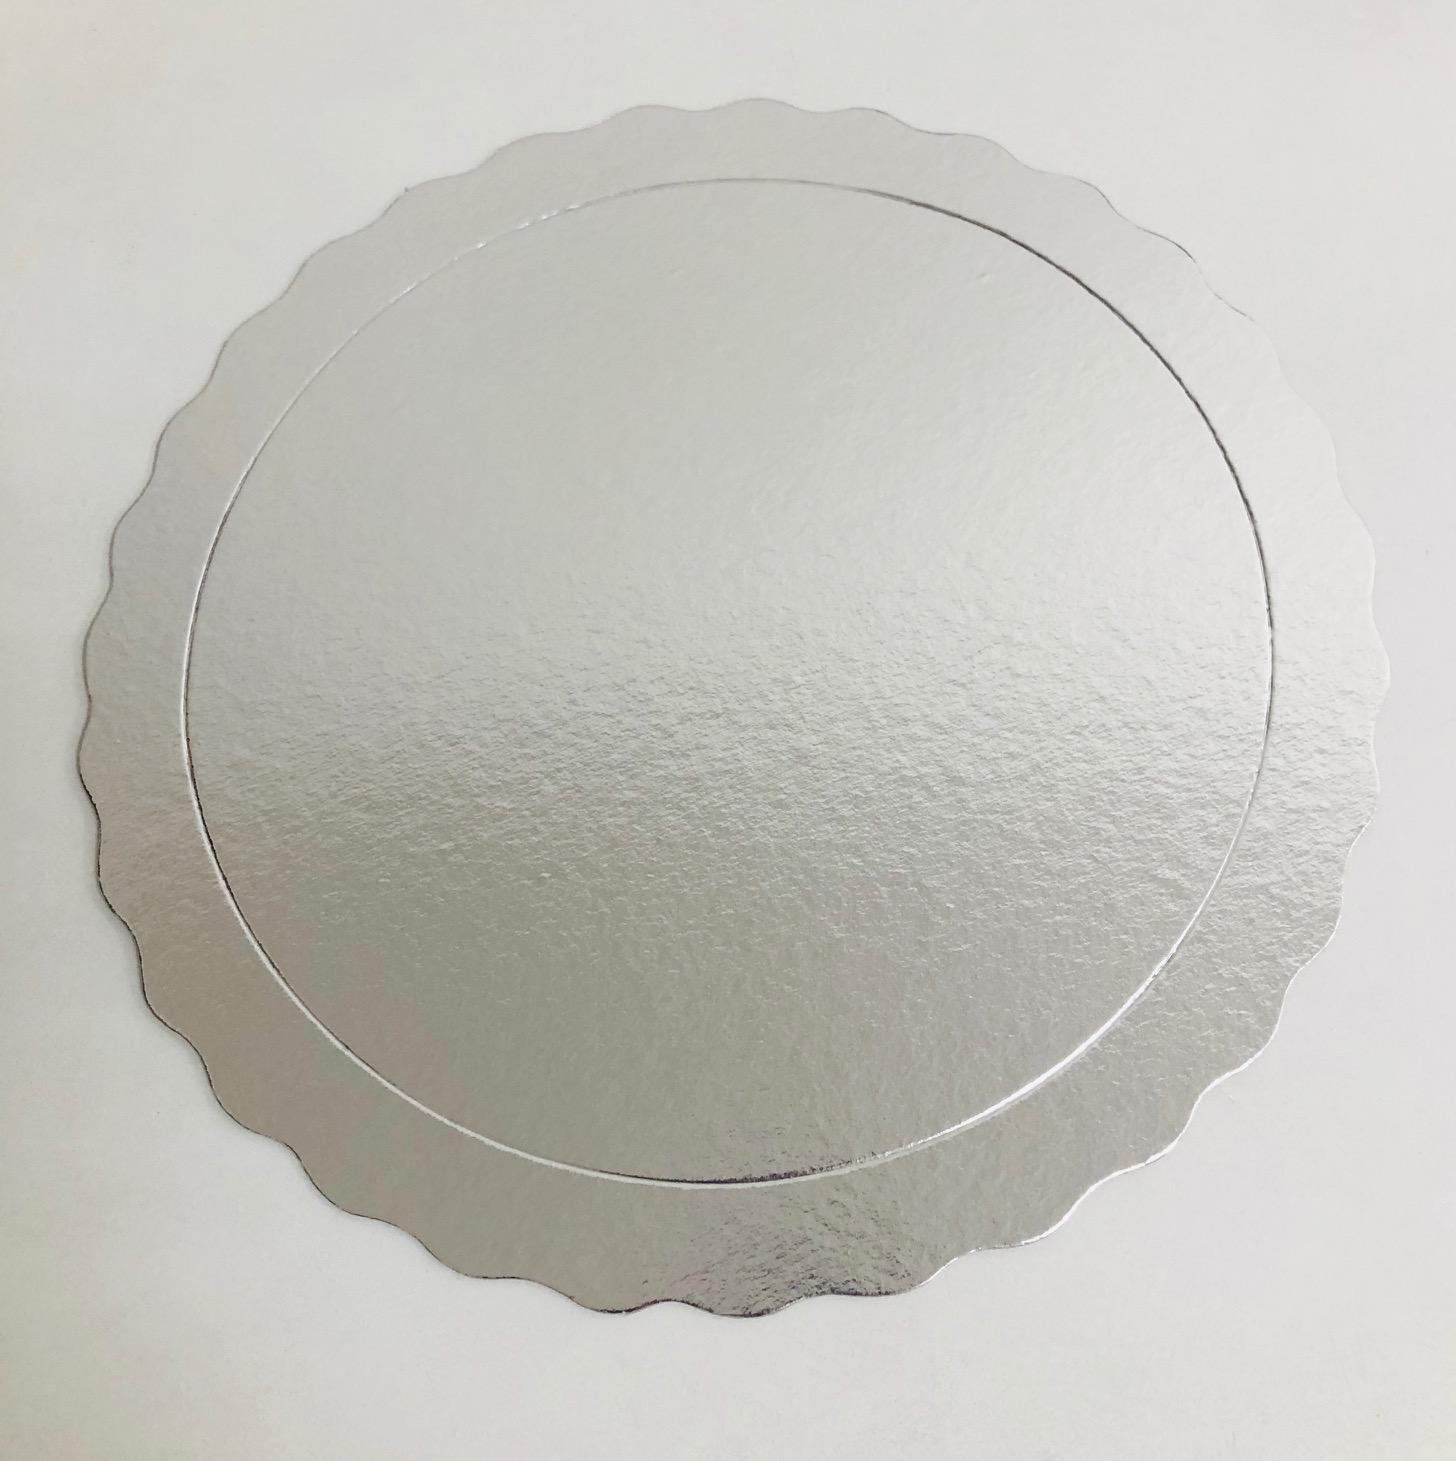 100 Bases Laminadas, Suporte P/ Bolo, Cake Board, 38cm - Prata